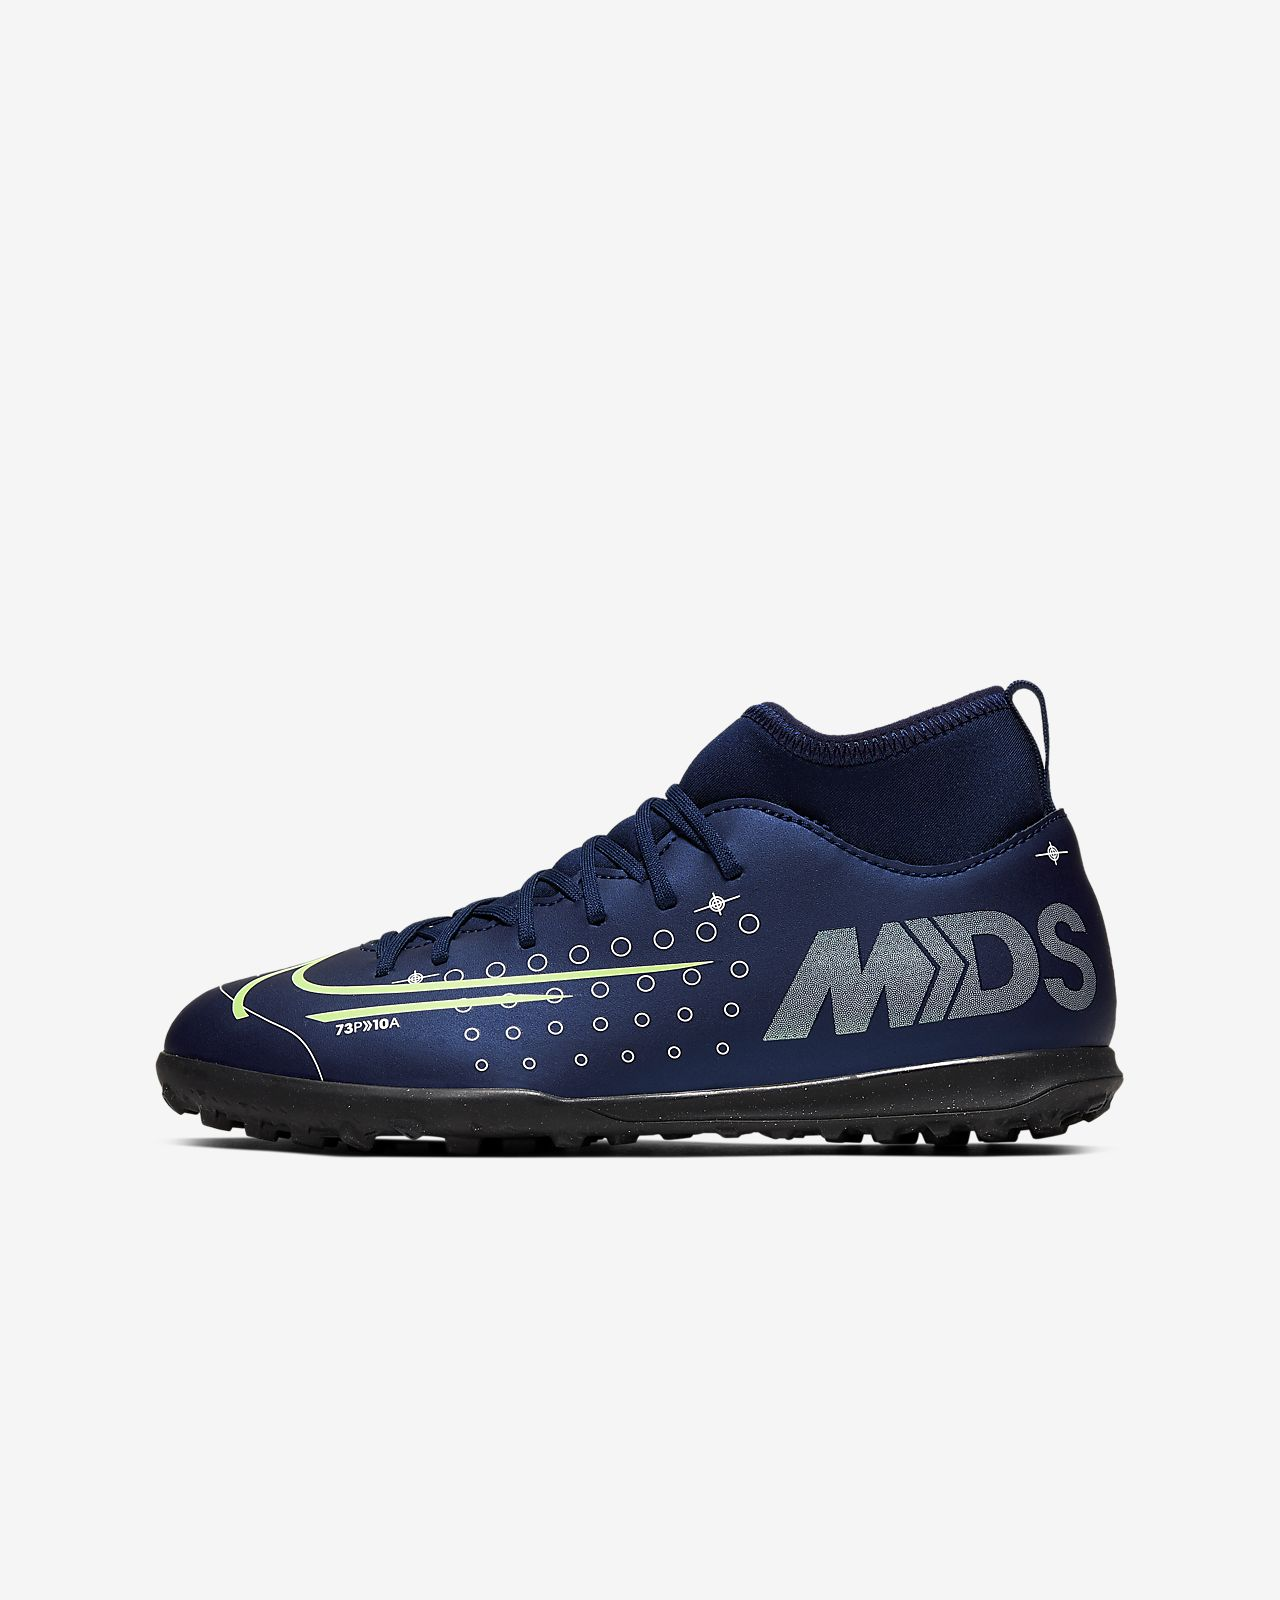 Nike Jr. Mercurial Superfly 7 Club MDS TF Fußballschuh für Kunstrasen für jüngereältere Kinder